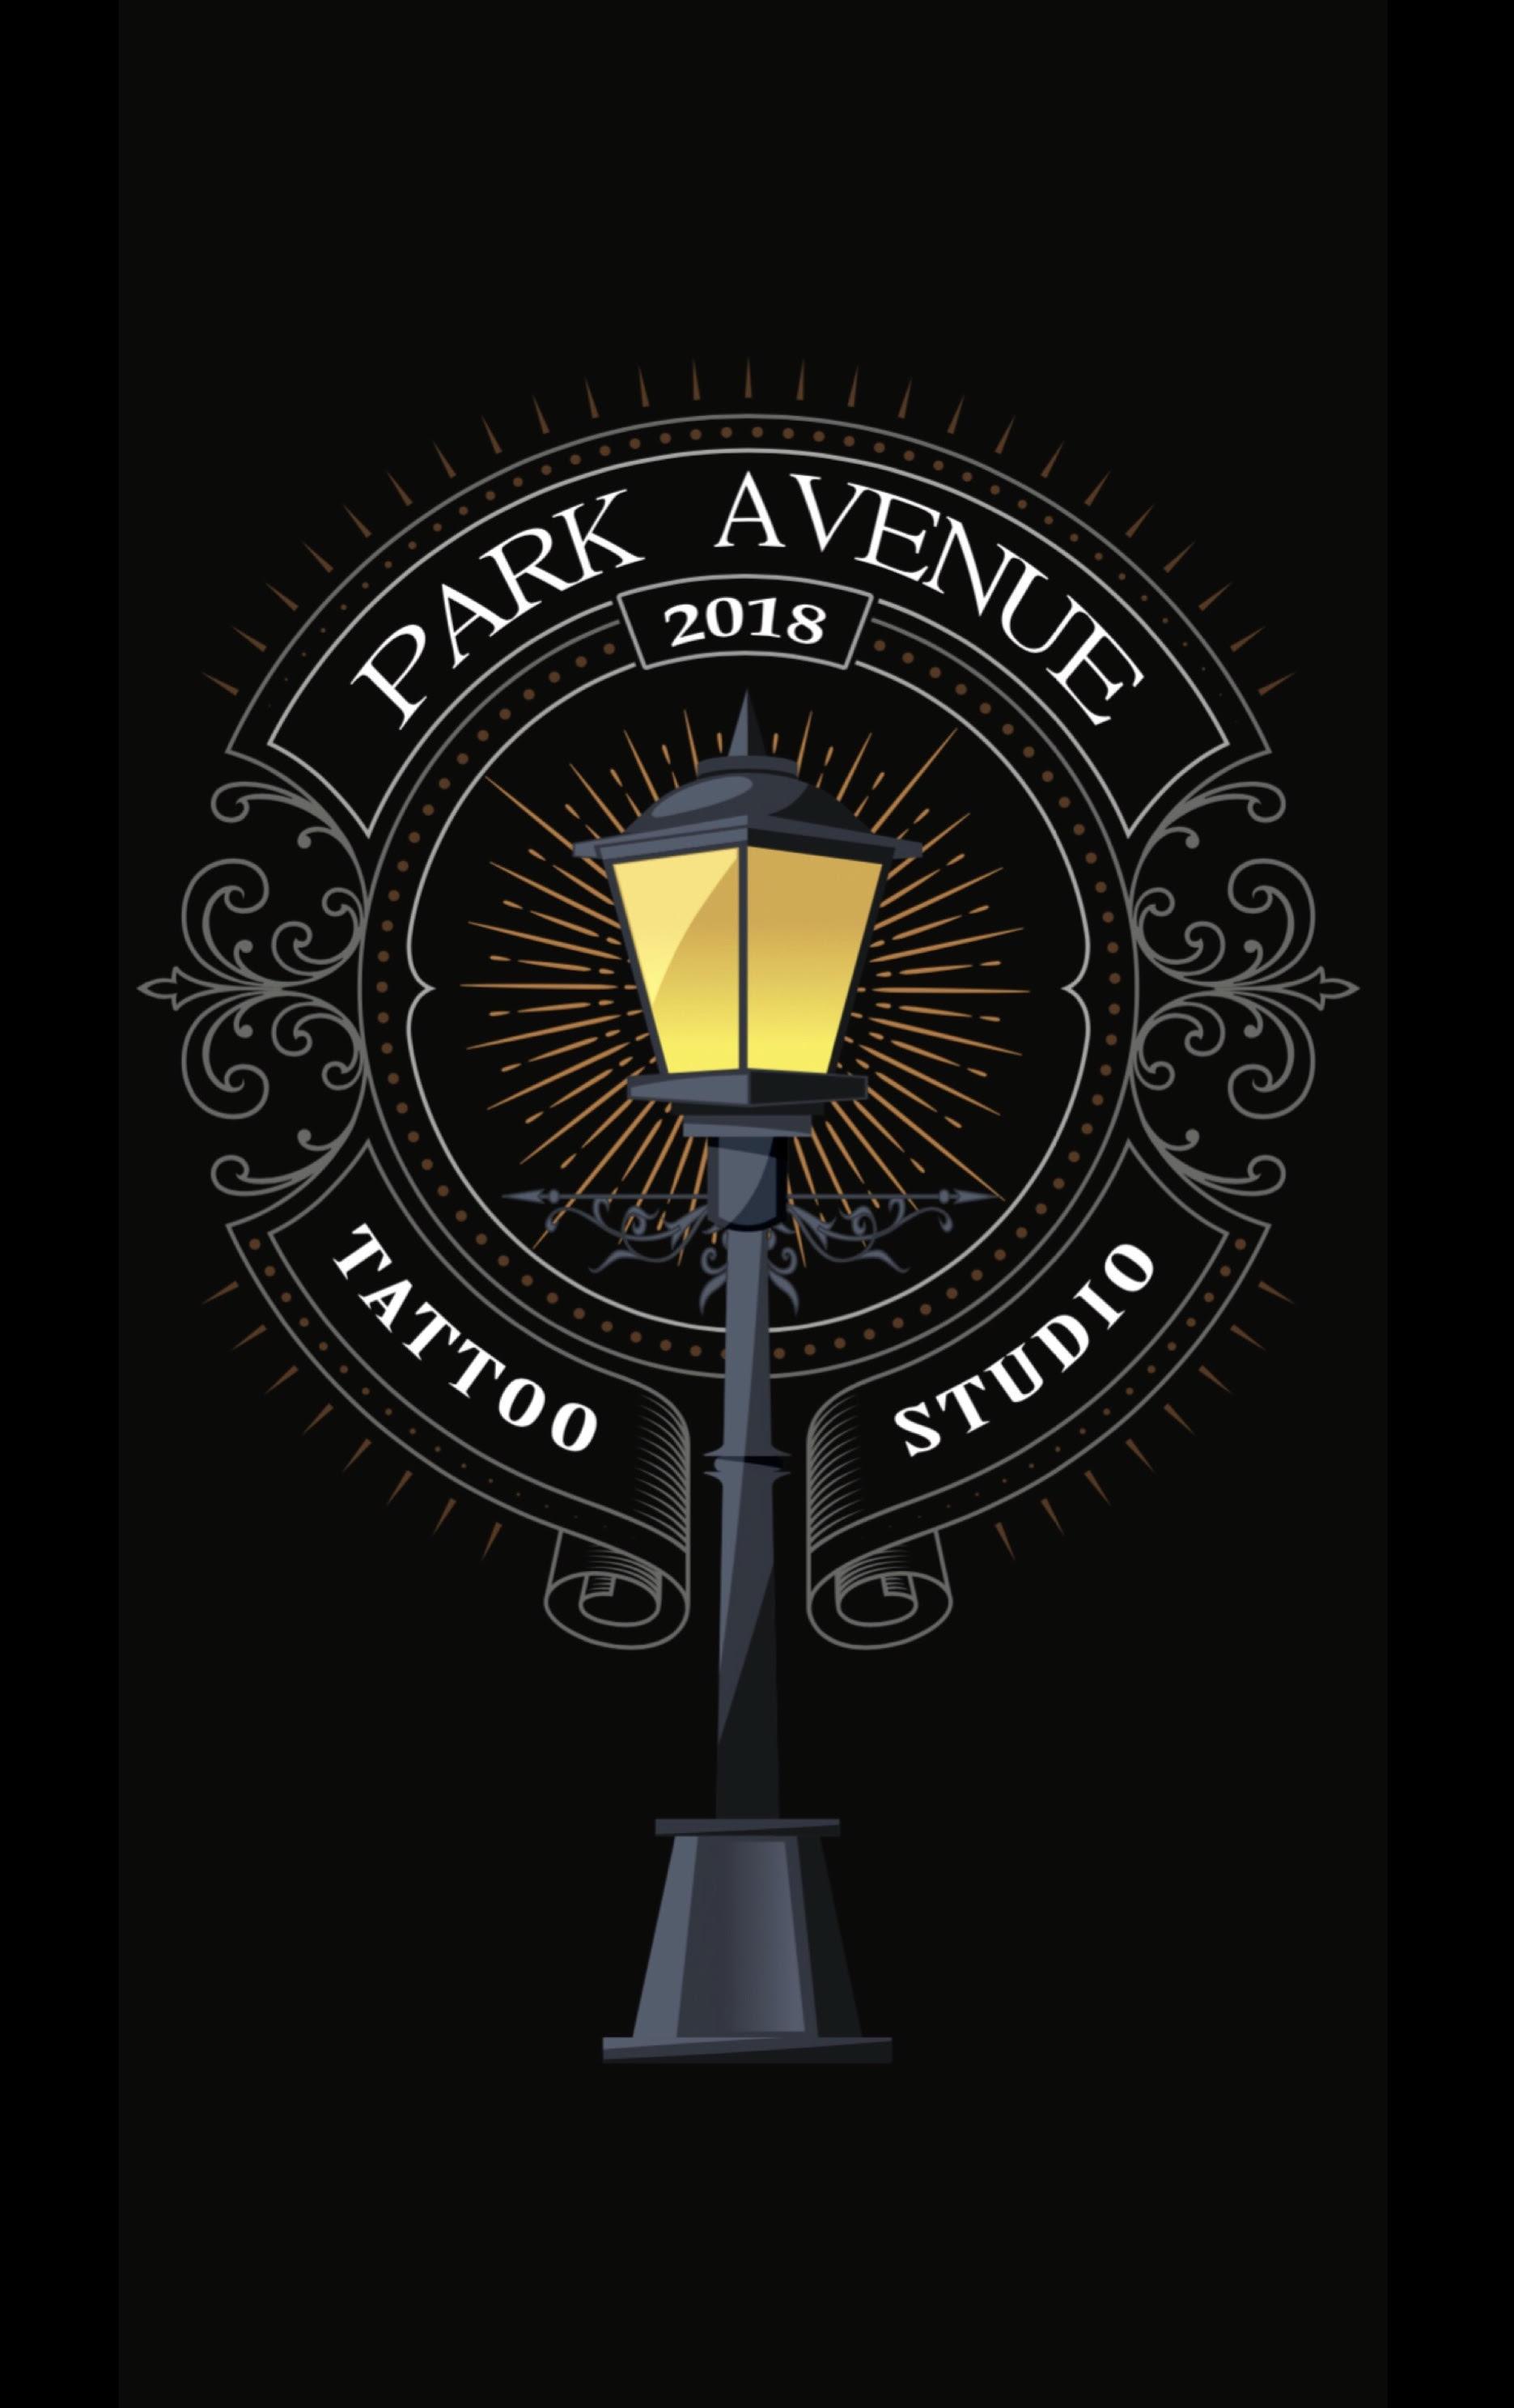 Park Avenue Tattoo